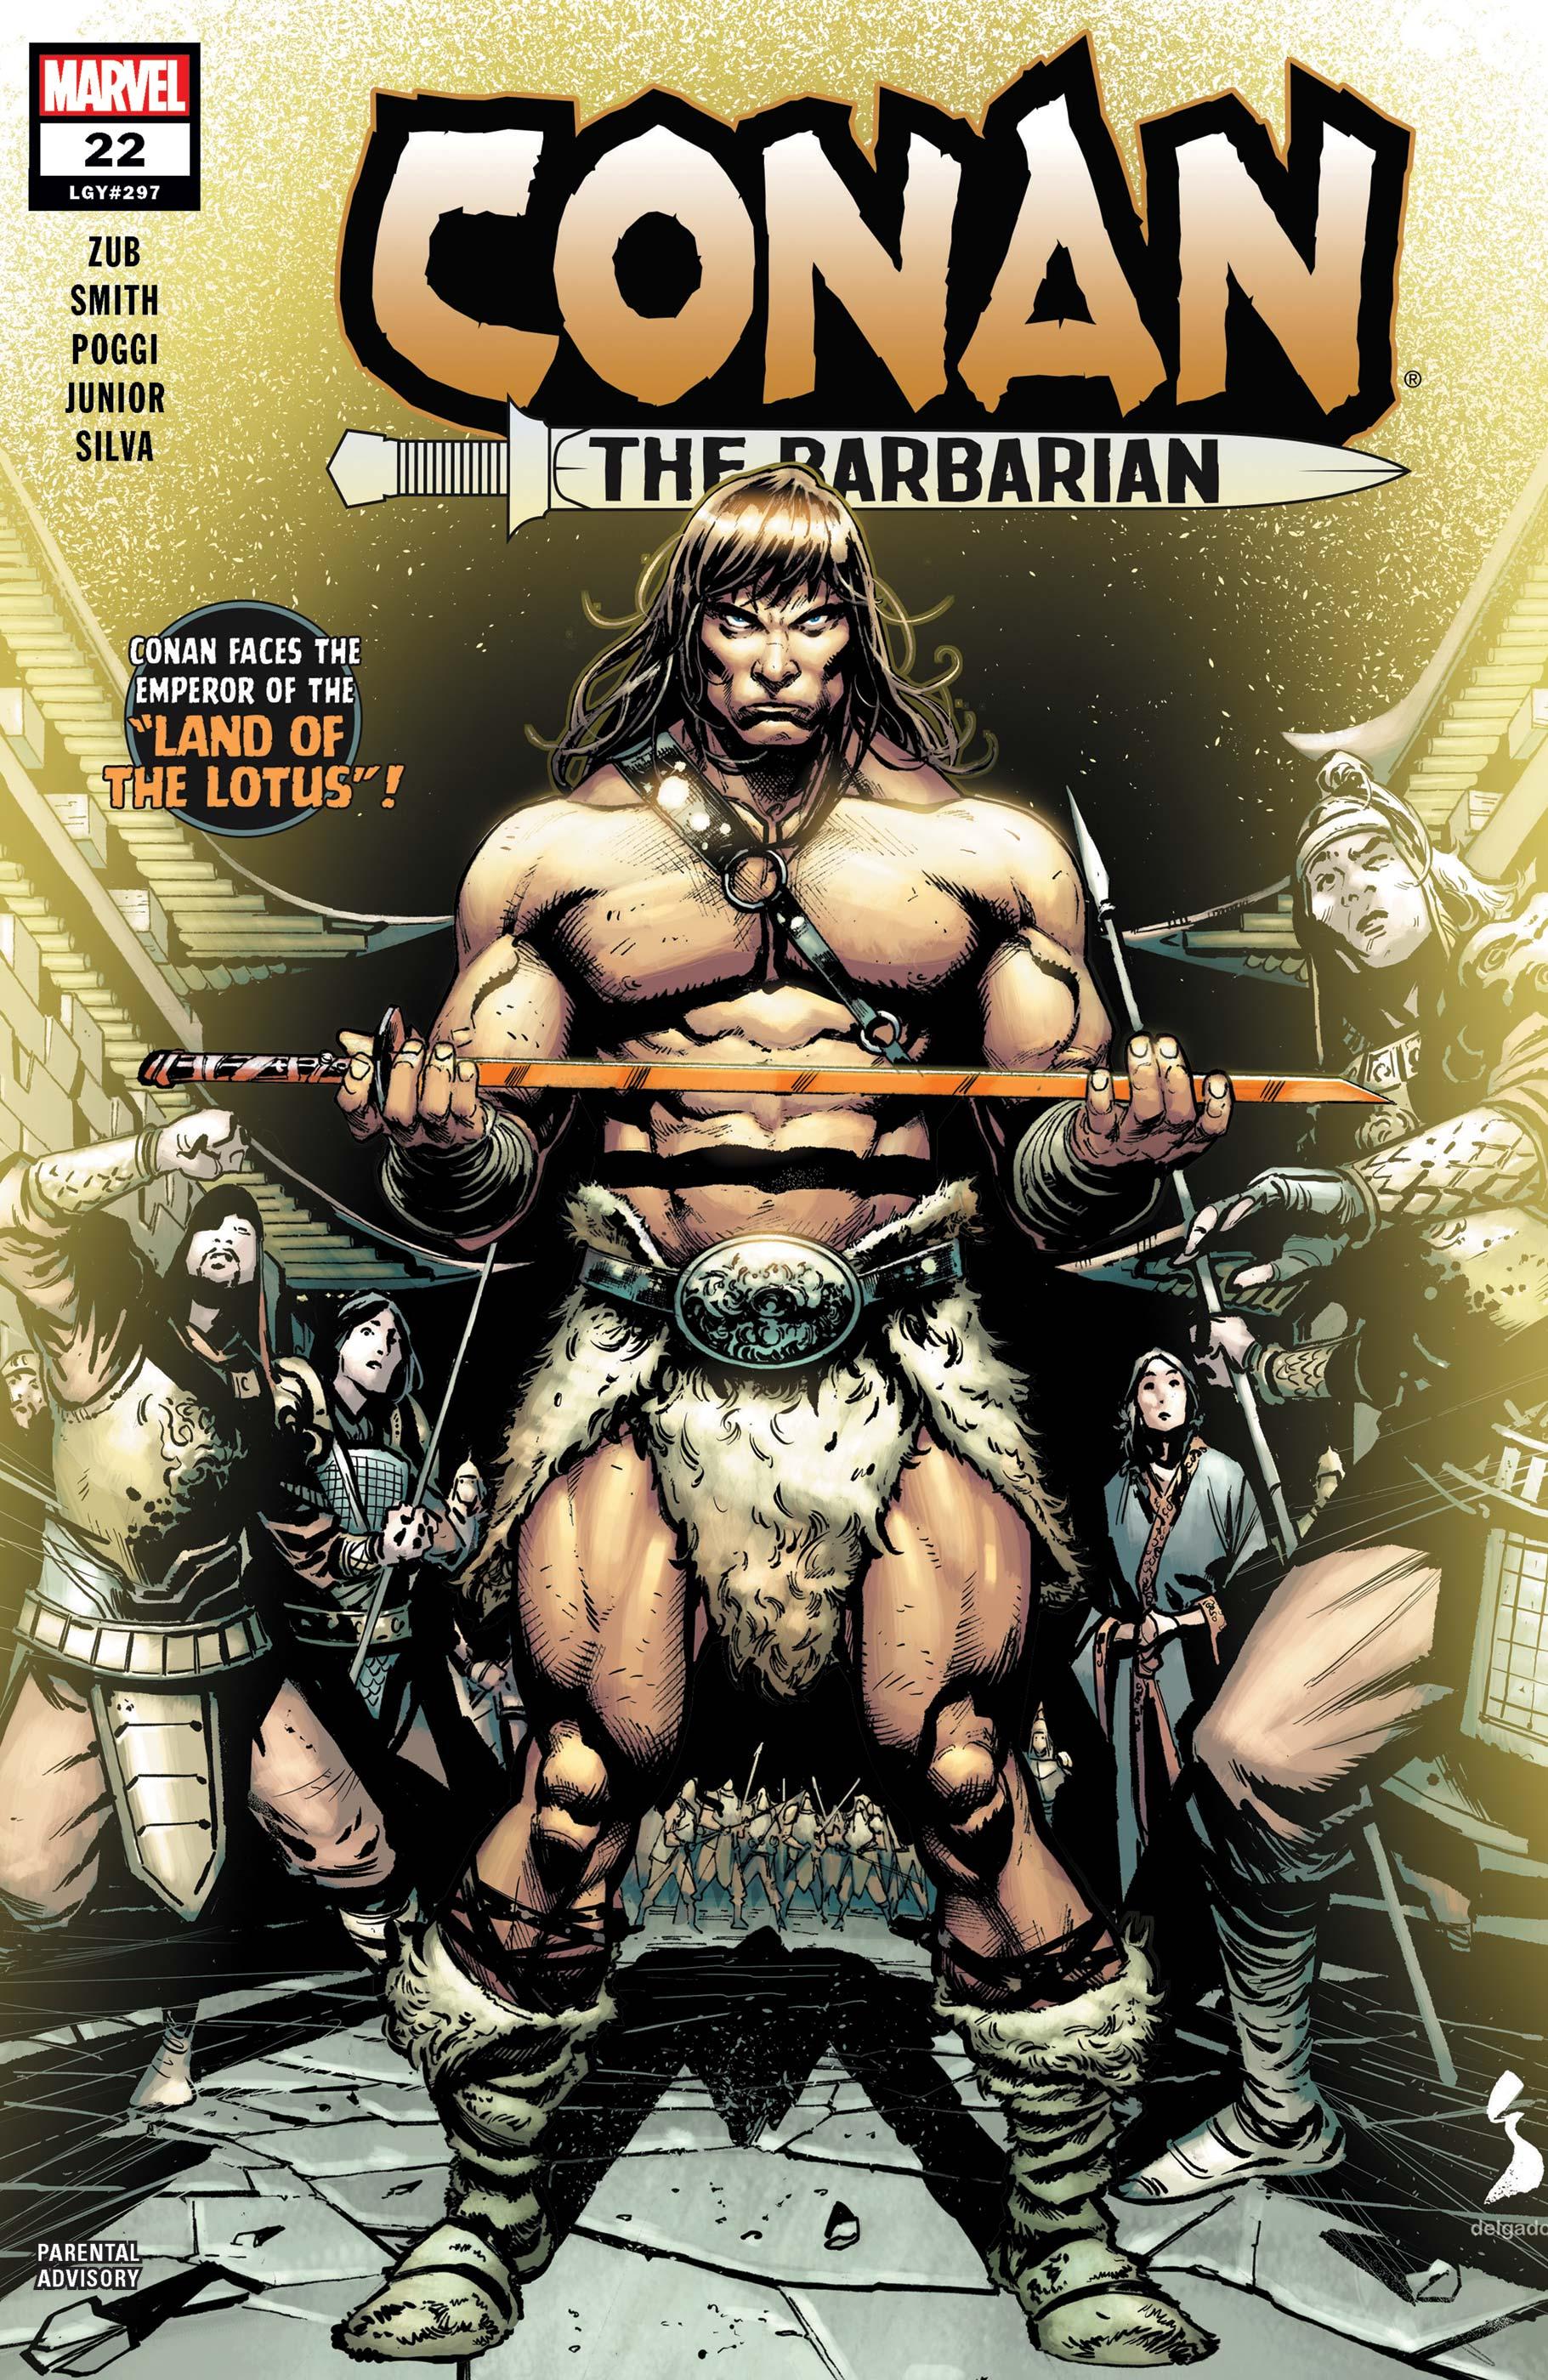 Conan the Barbarian (2019) #22